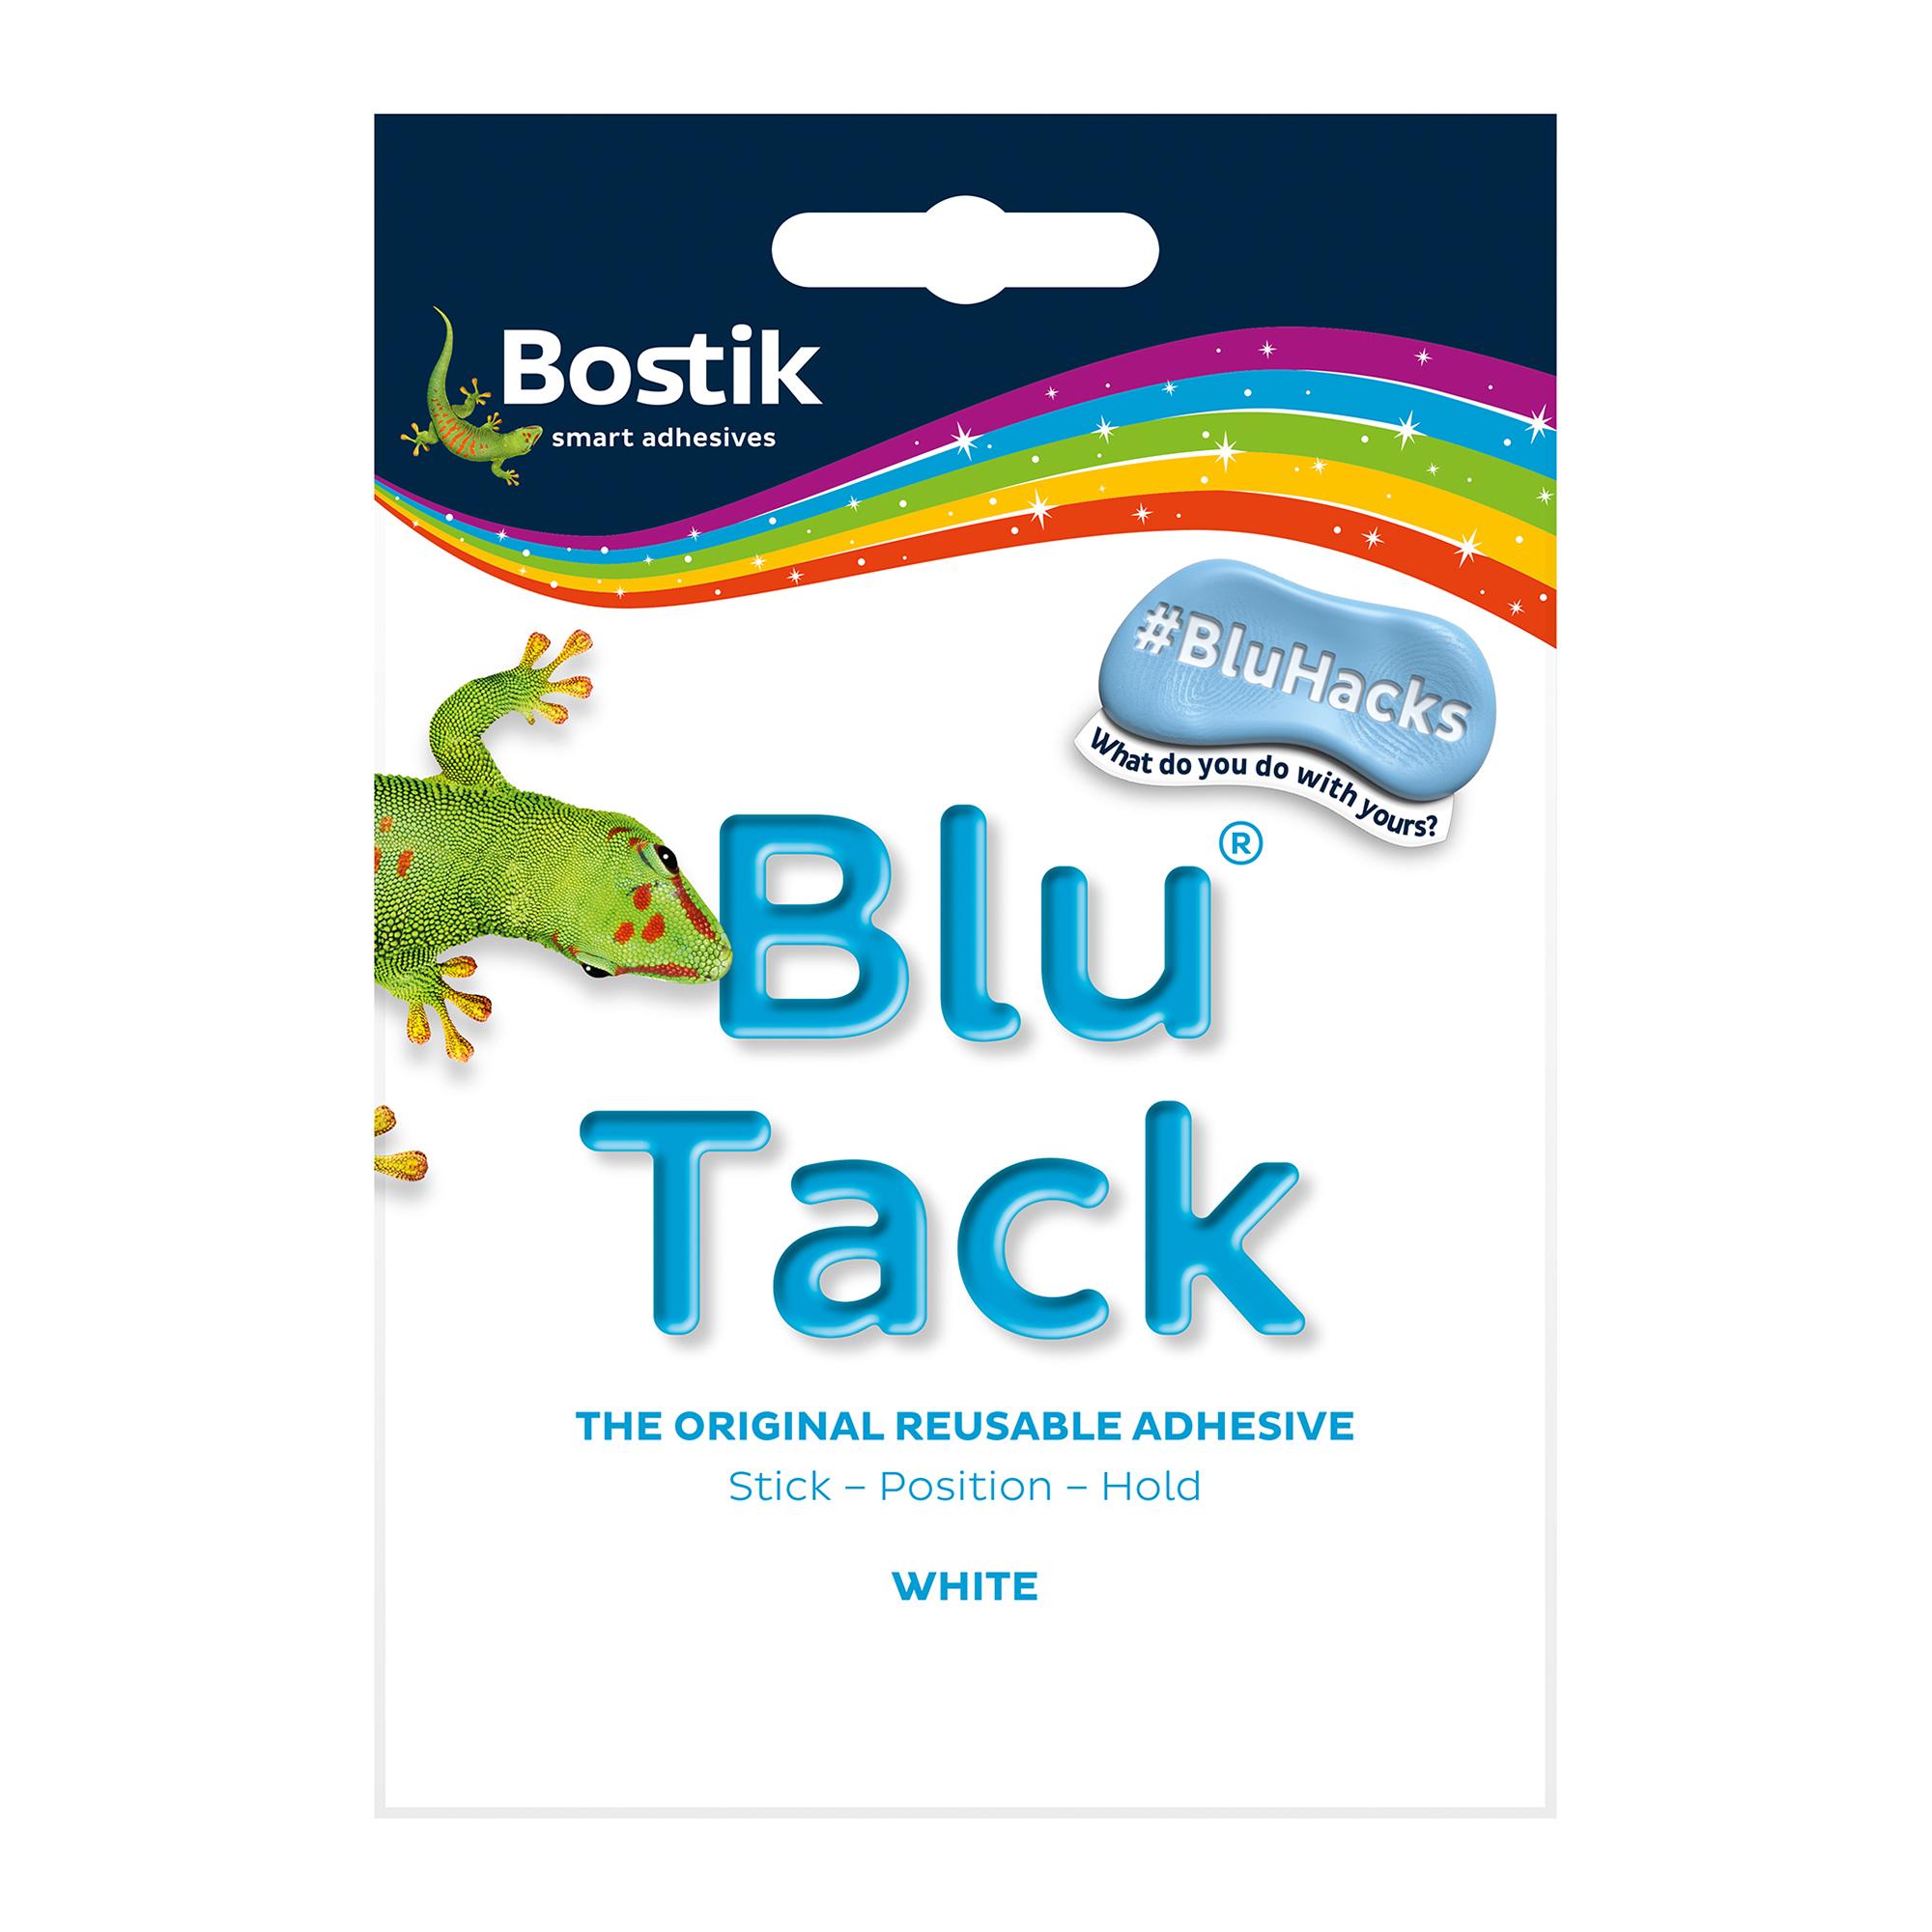 Tack Bostik Blu Tack White Mastic Adhesive Non-toxic Handy Pack 60g Ref 801127 Pack 12